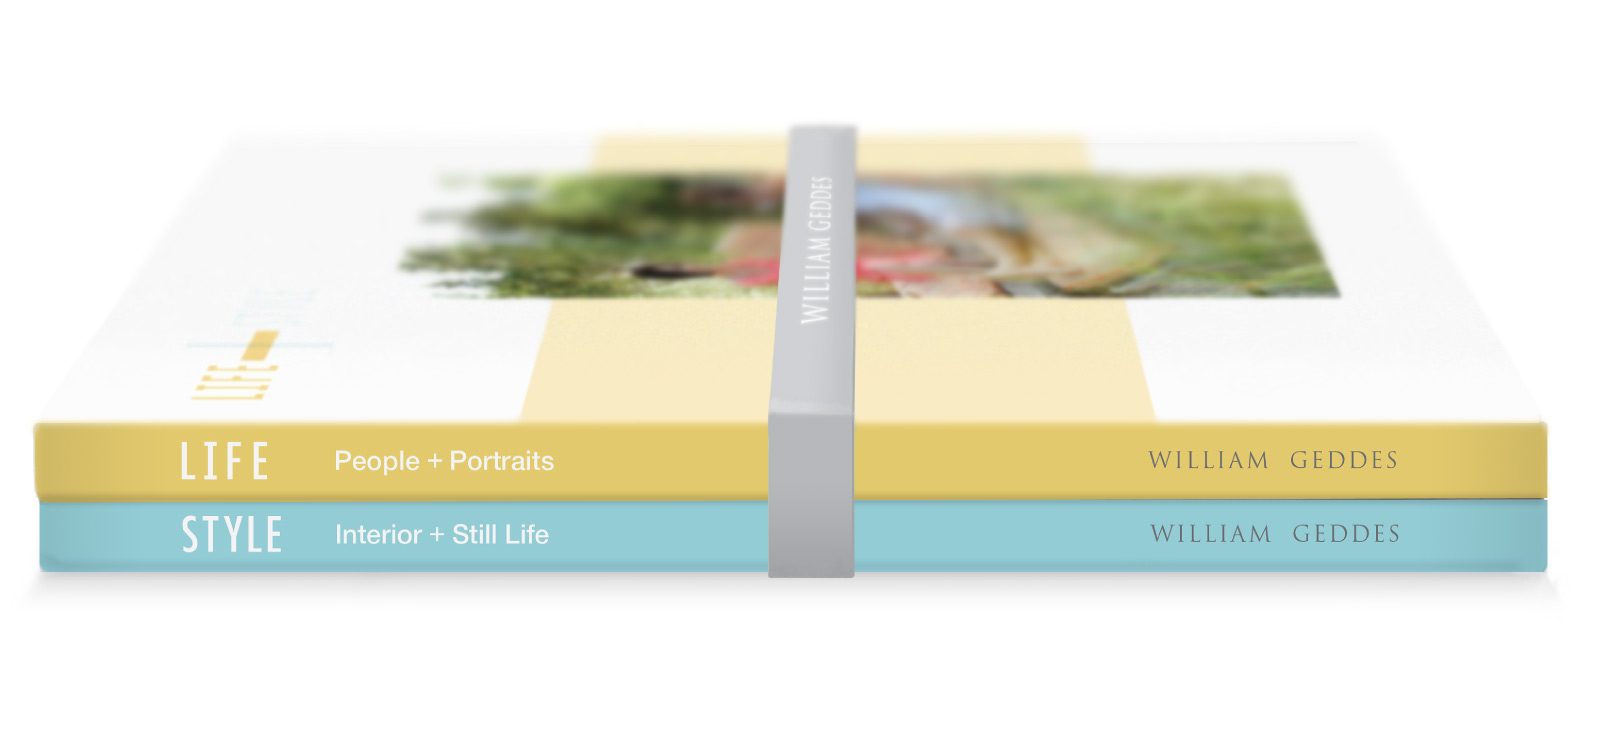 MSLK-William-Geddes-Blurb-Books-21